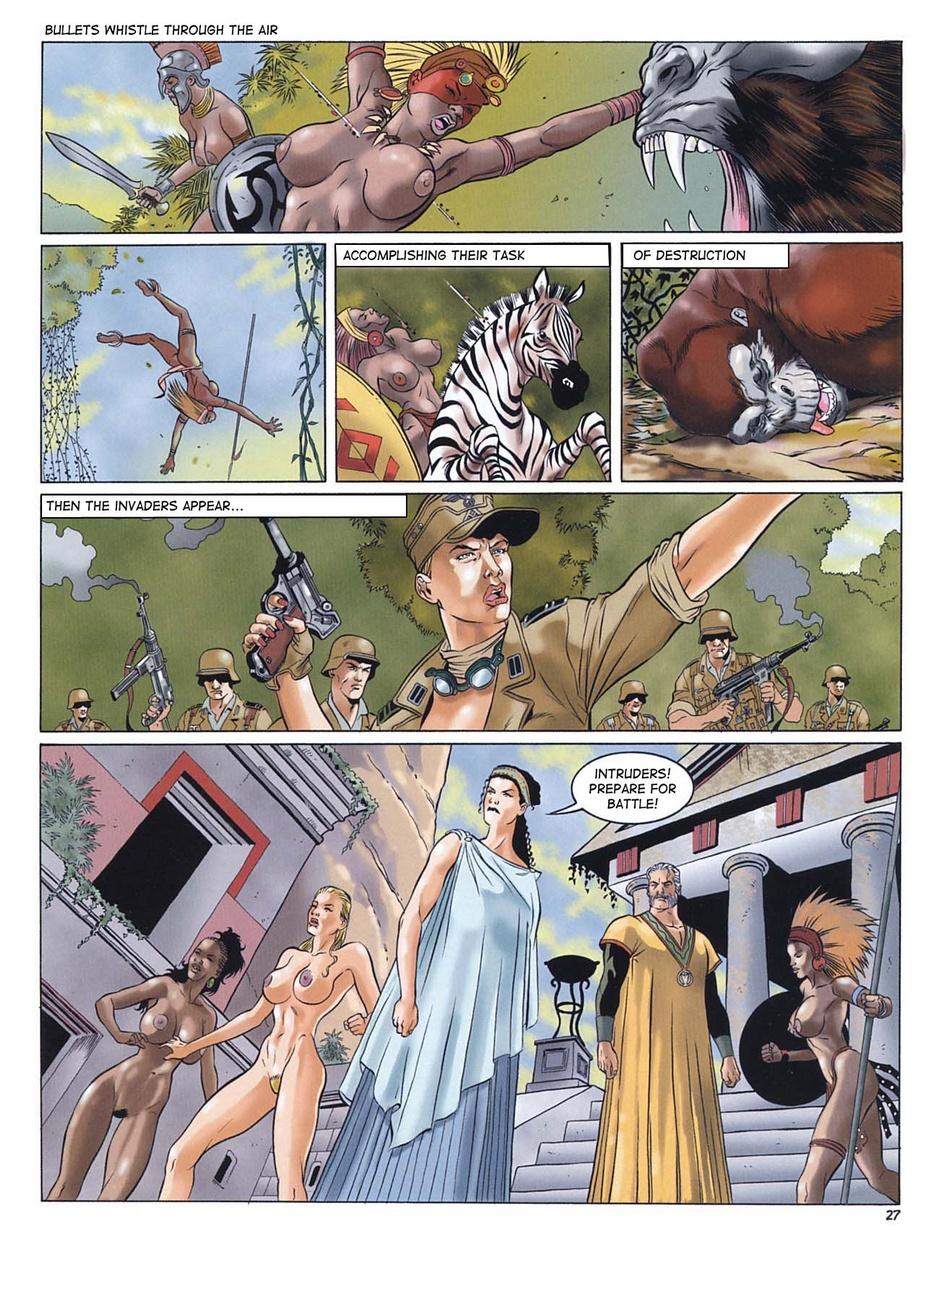 Lara Jones 1 - The Amazons - part 2